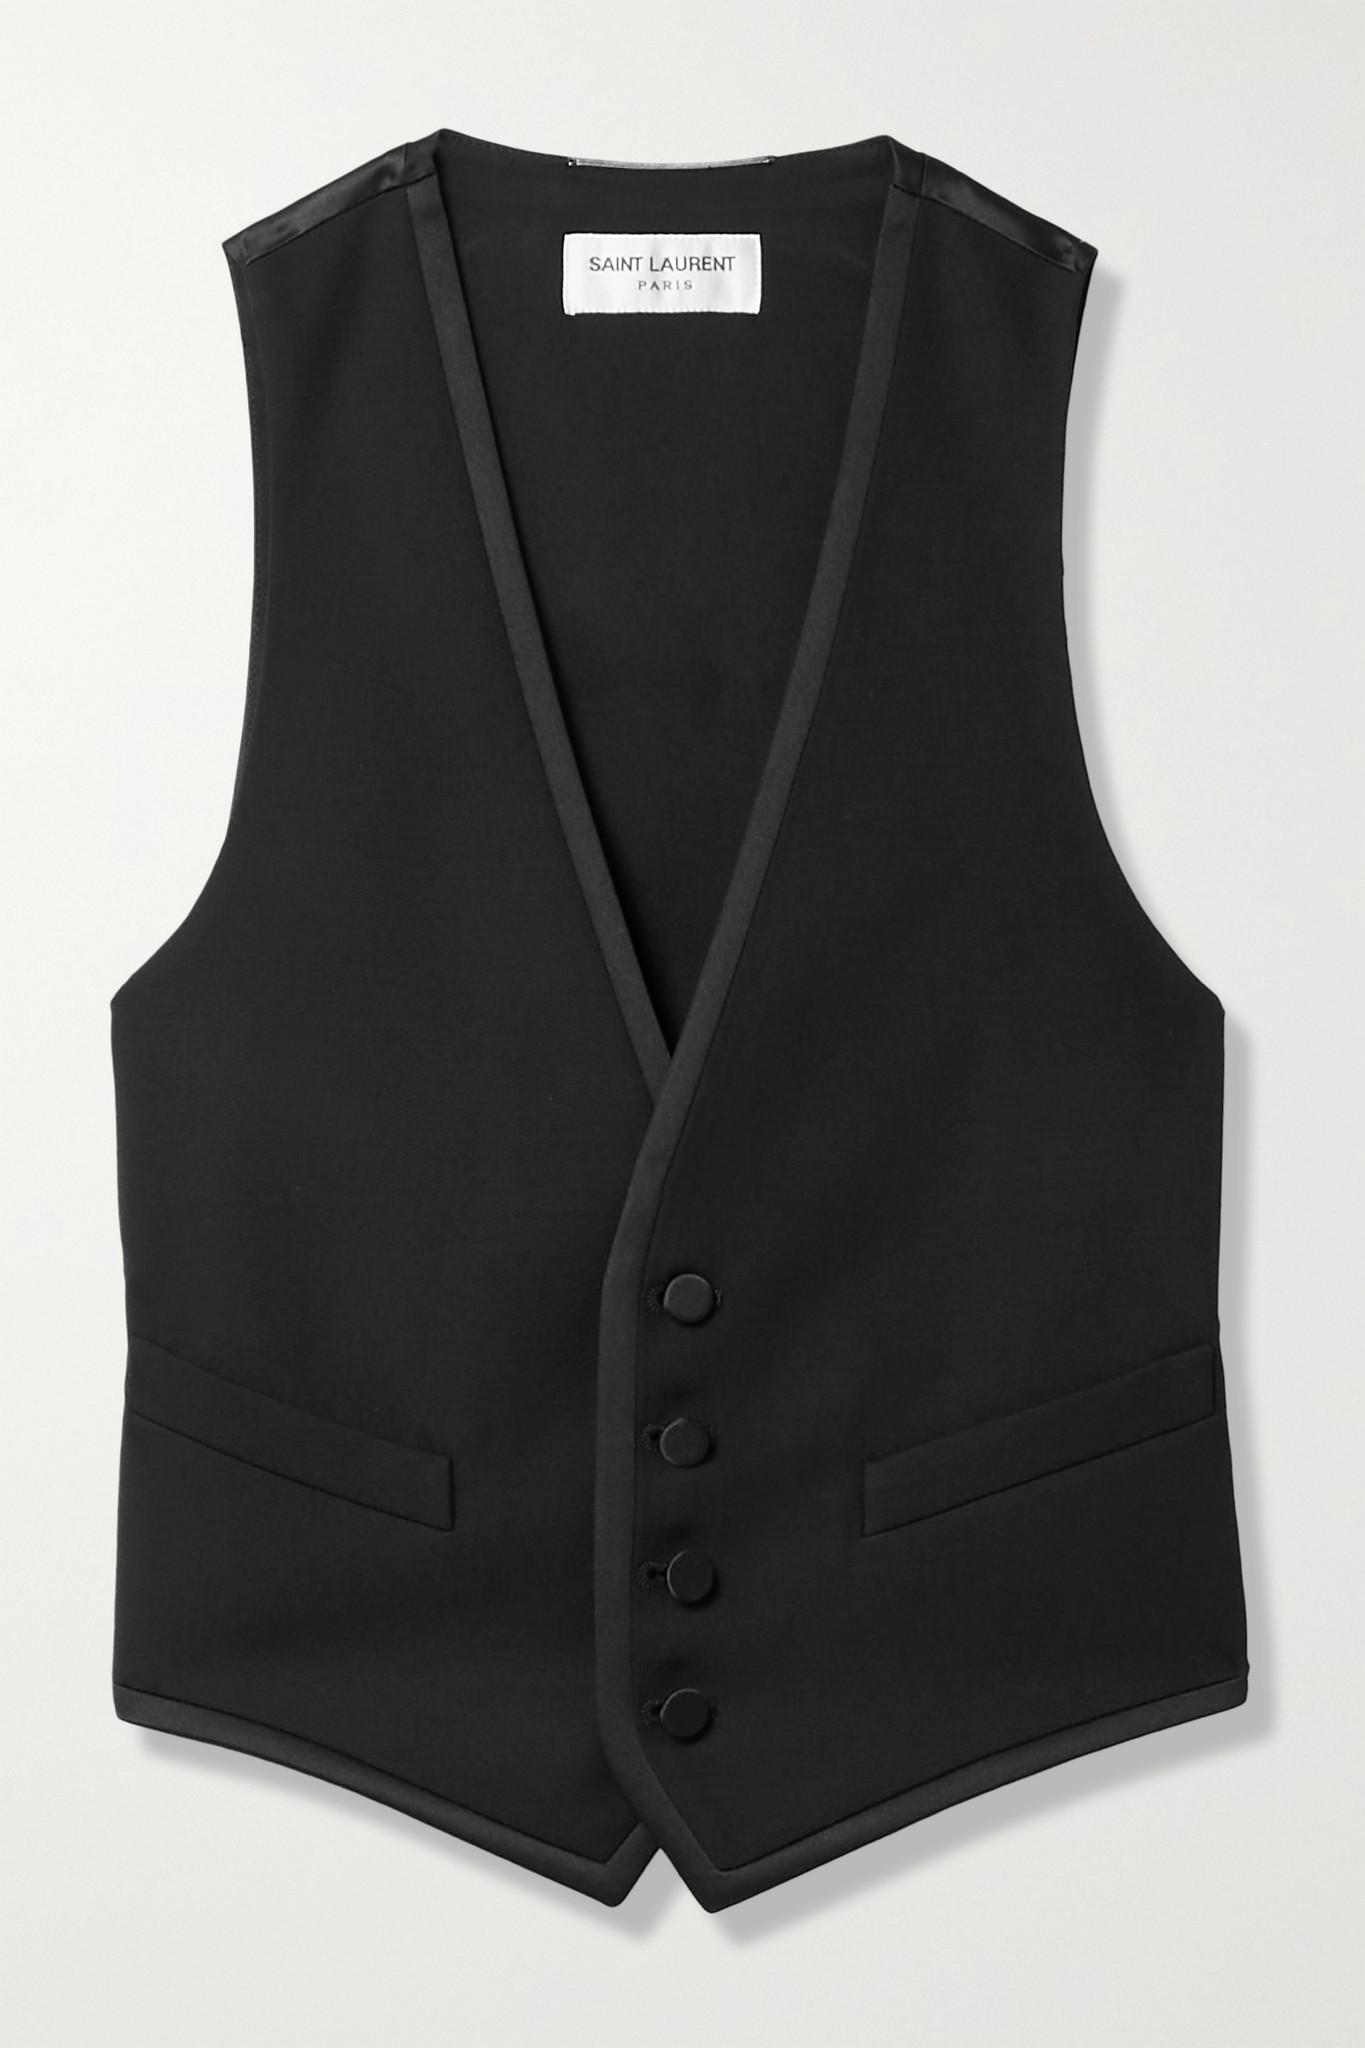 SAINT LAURENT - 粒纹羊毛丝缎短款马甲 - 黑色 - x small